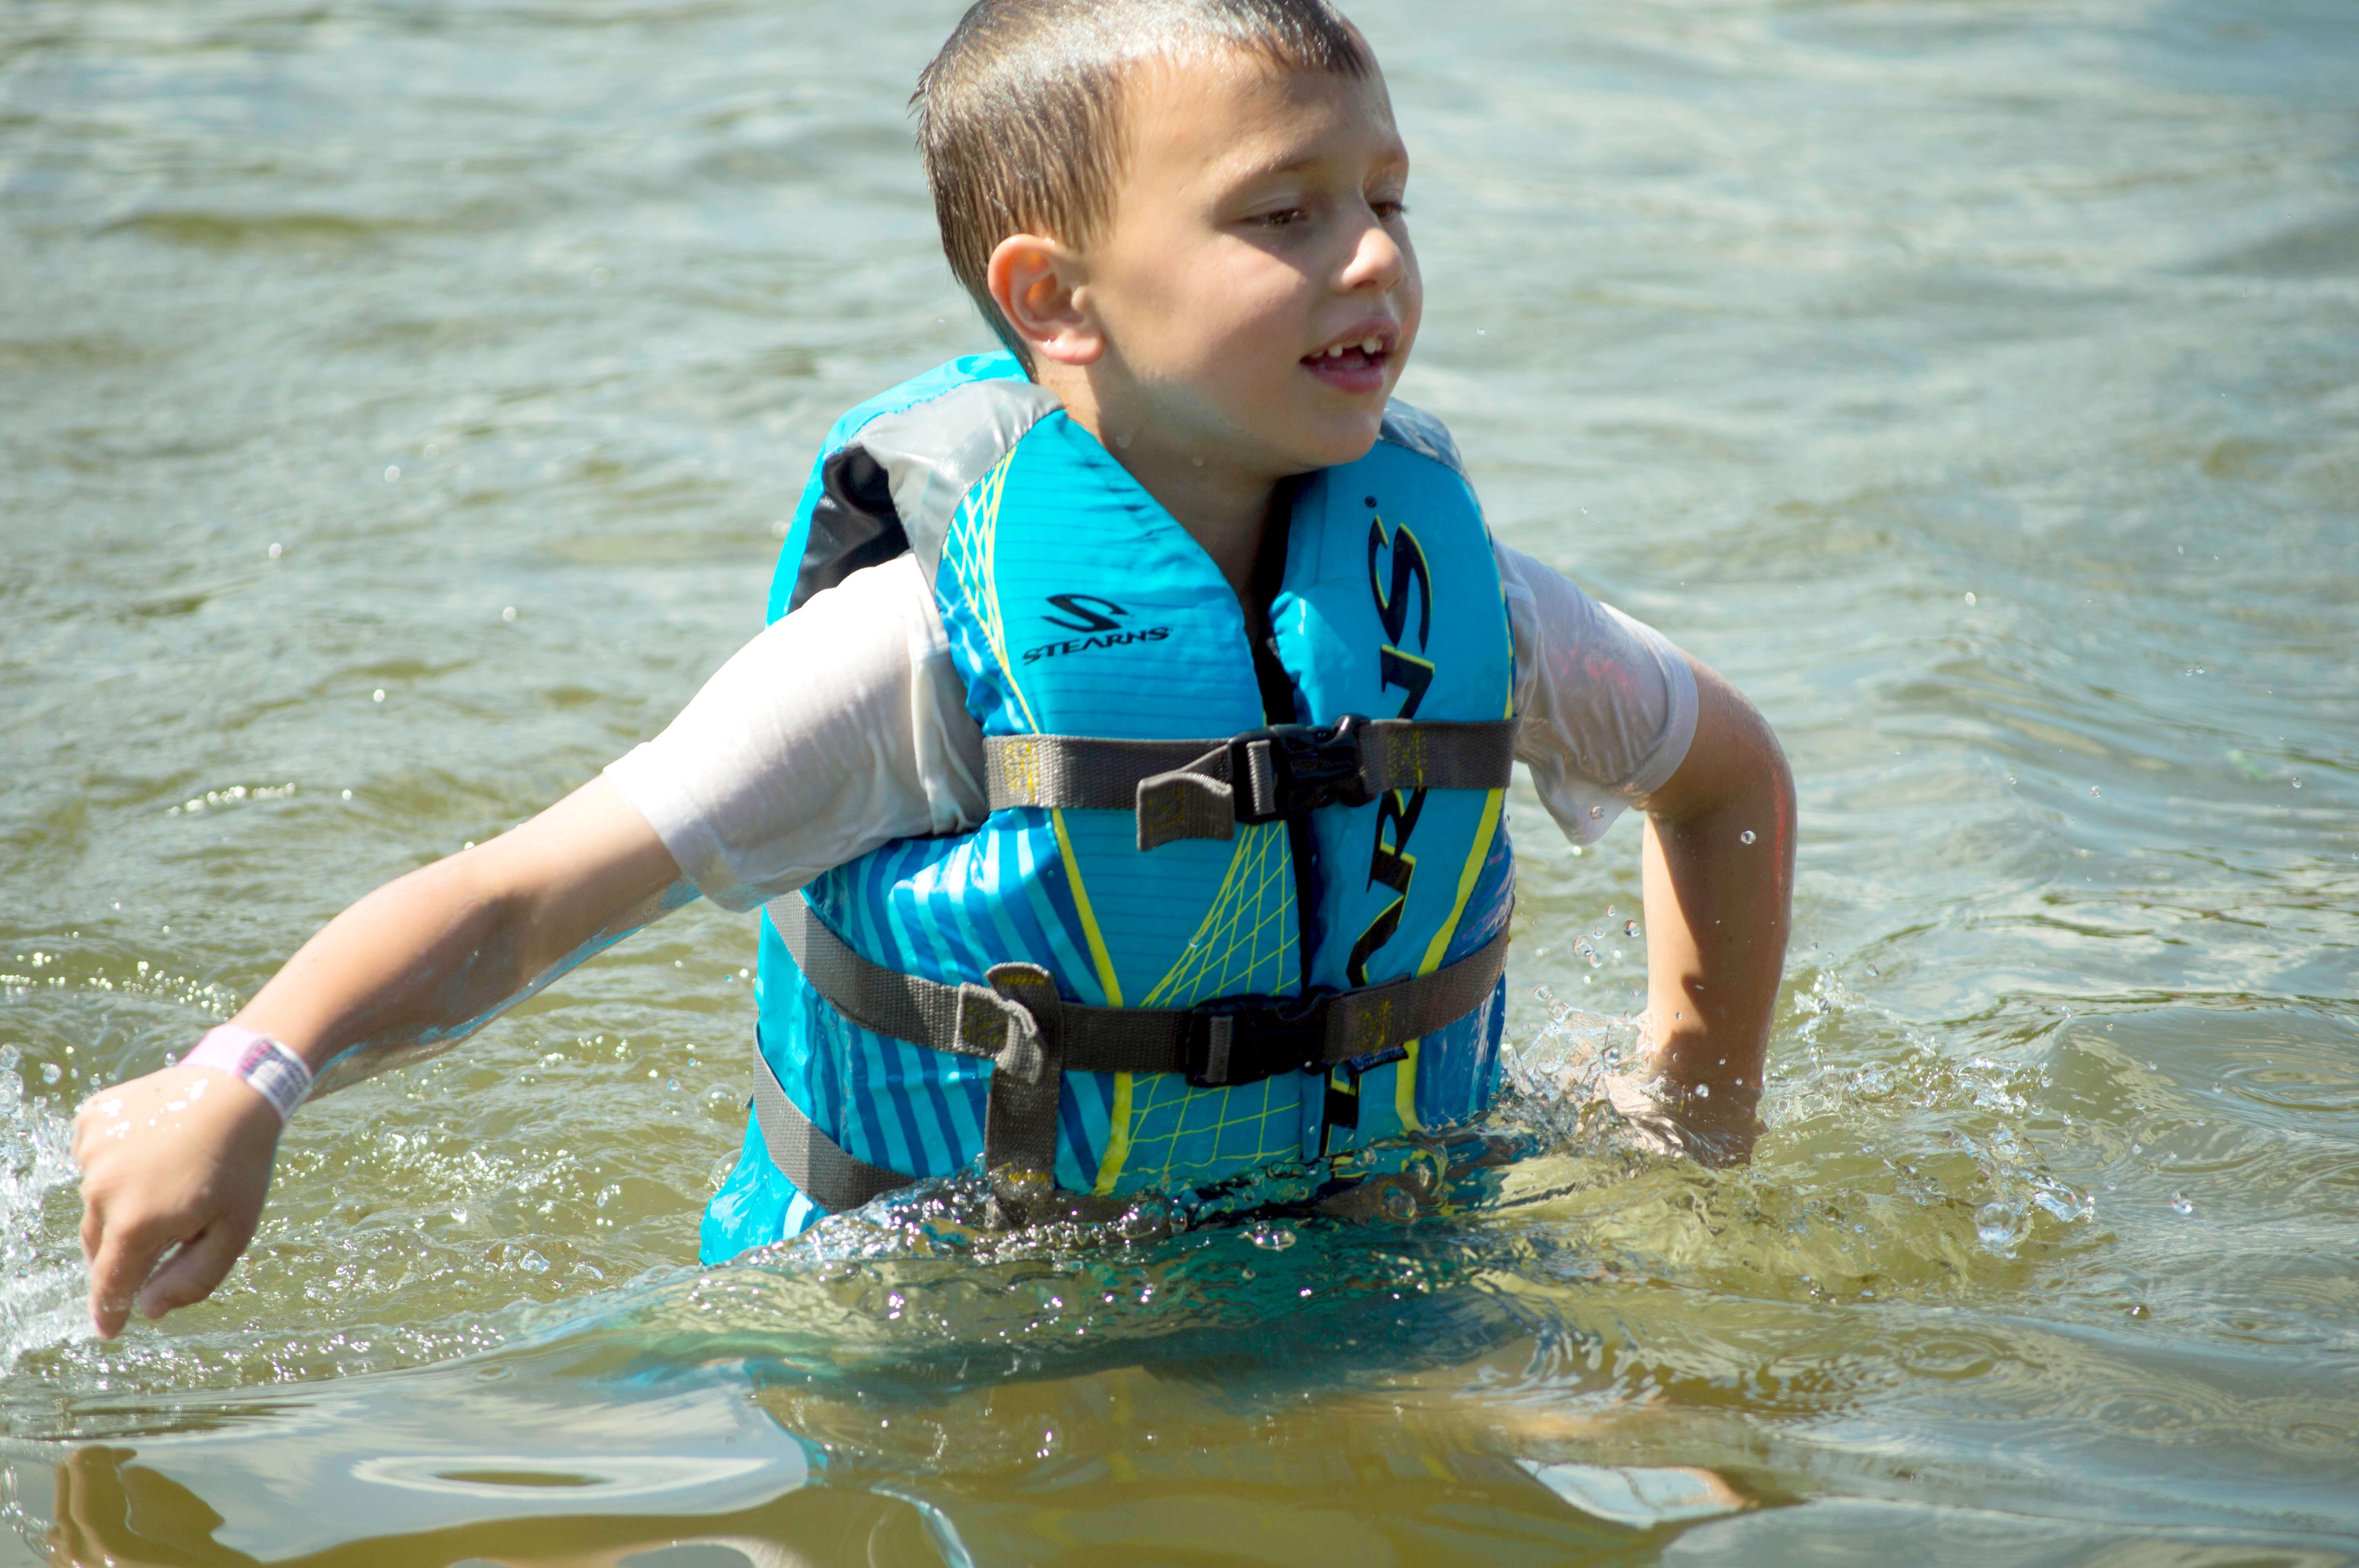 Boy wearing a life jacket swimming in Snail Lake.